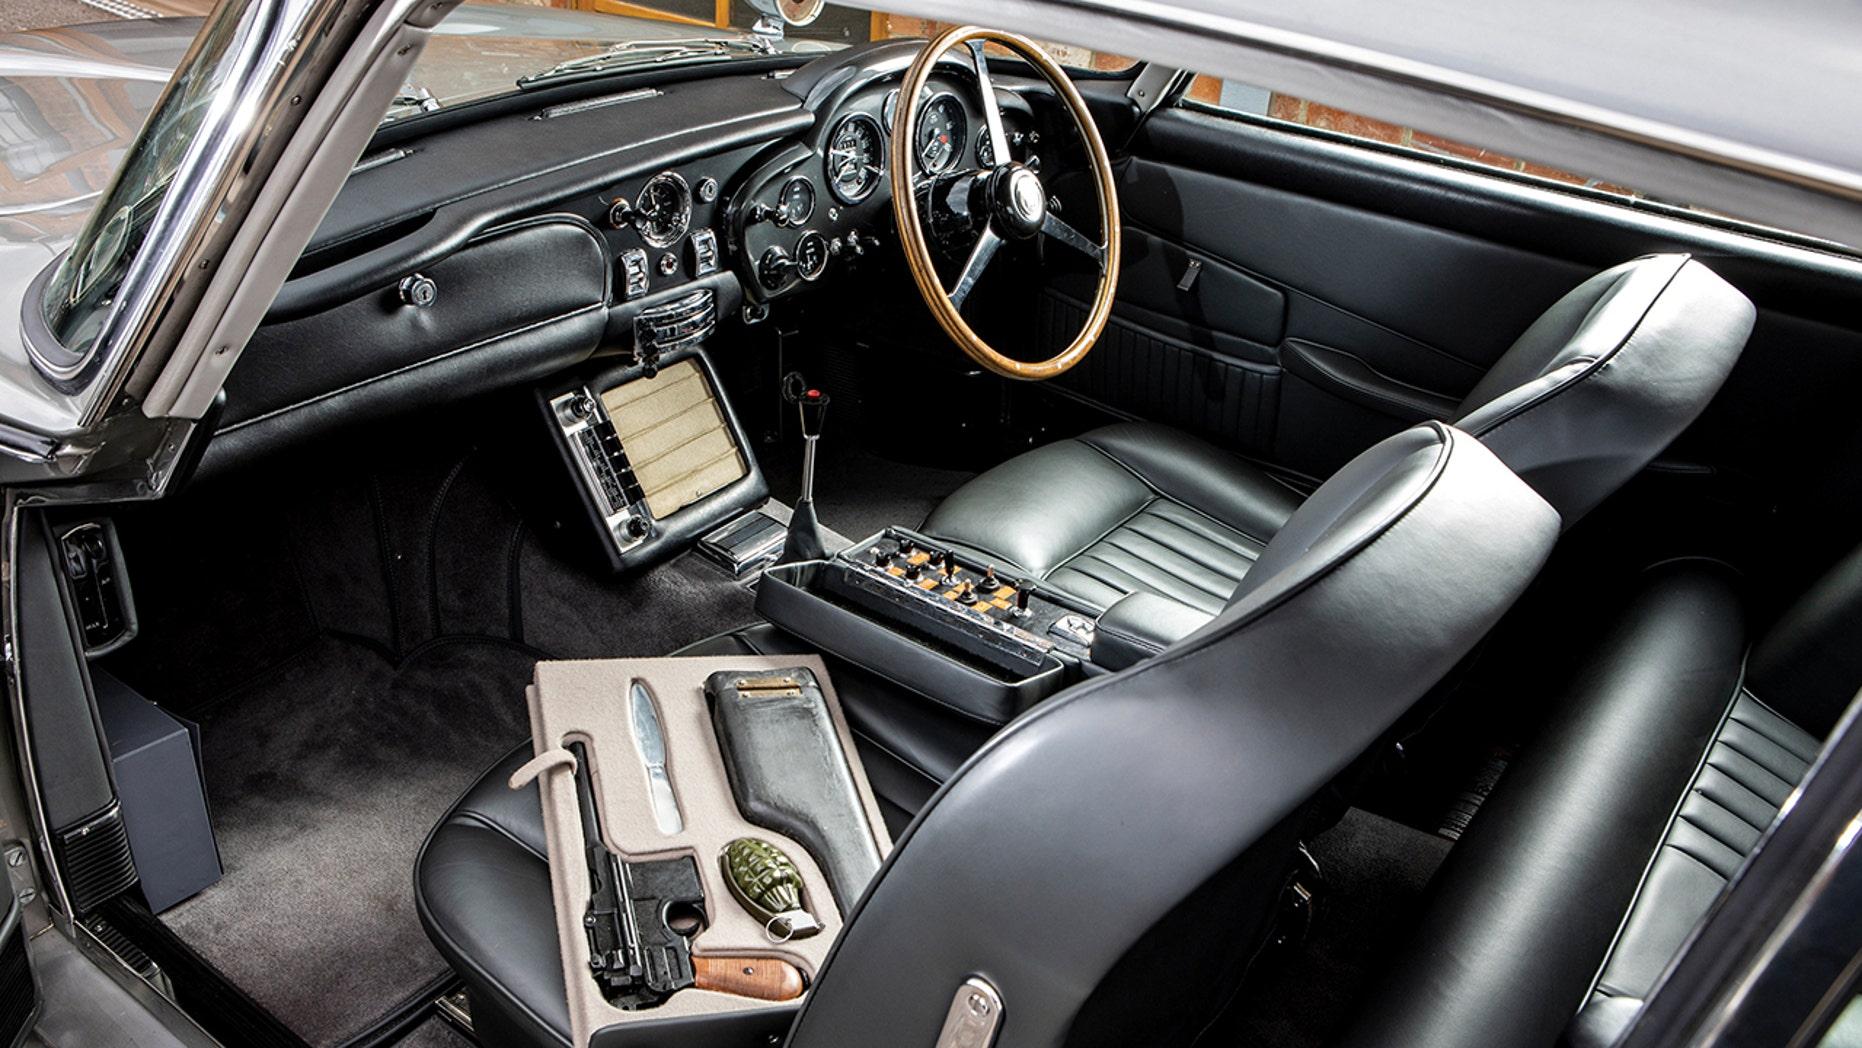 James Bond Aston Martin DB5 interior